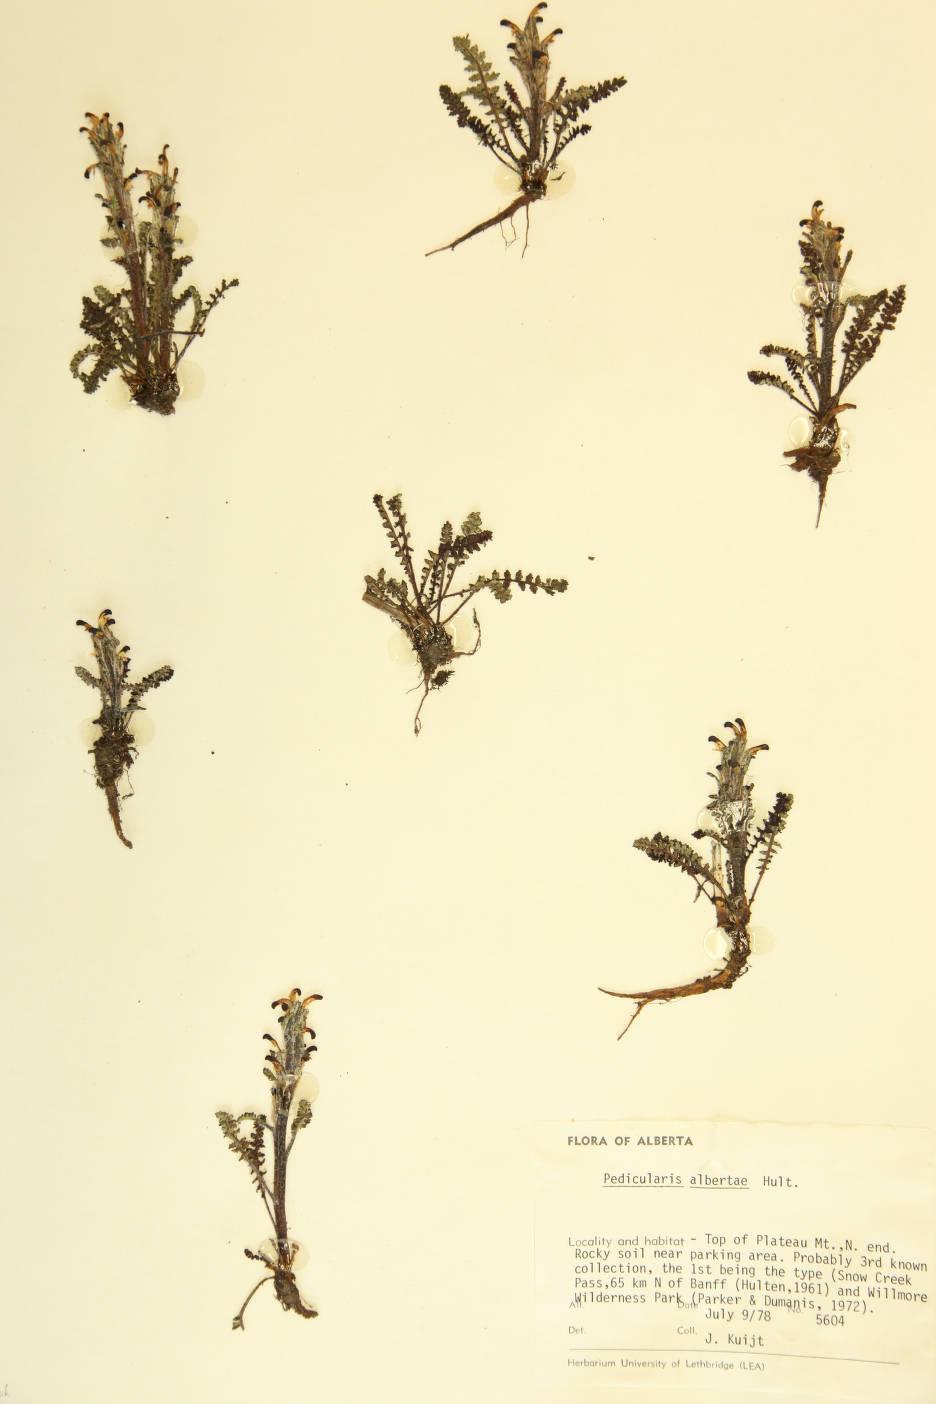 Image of Pedicularis albertae